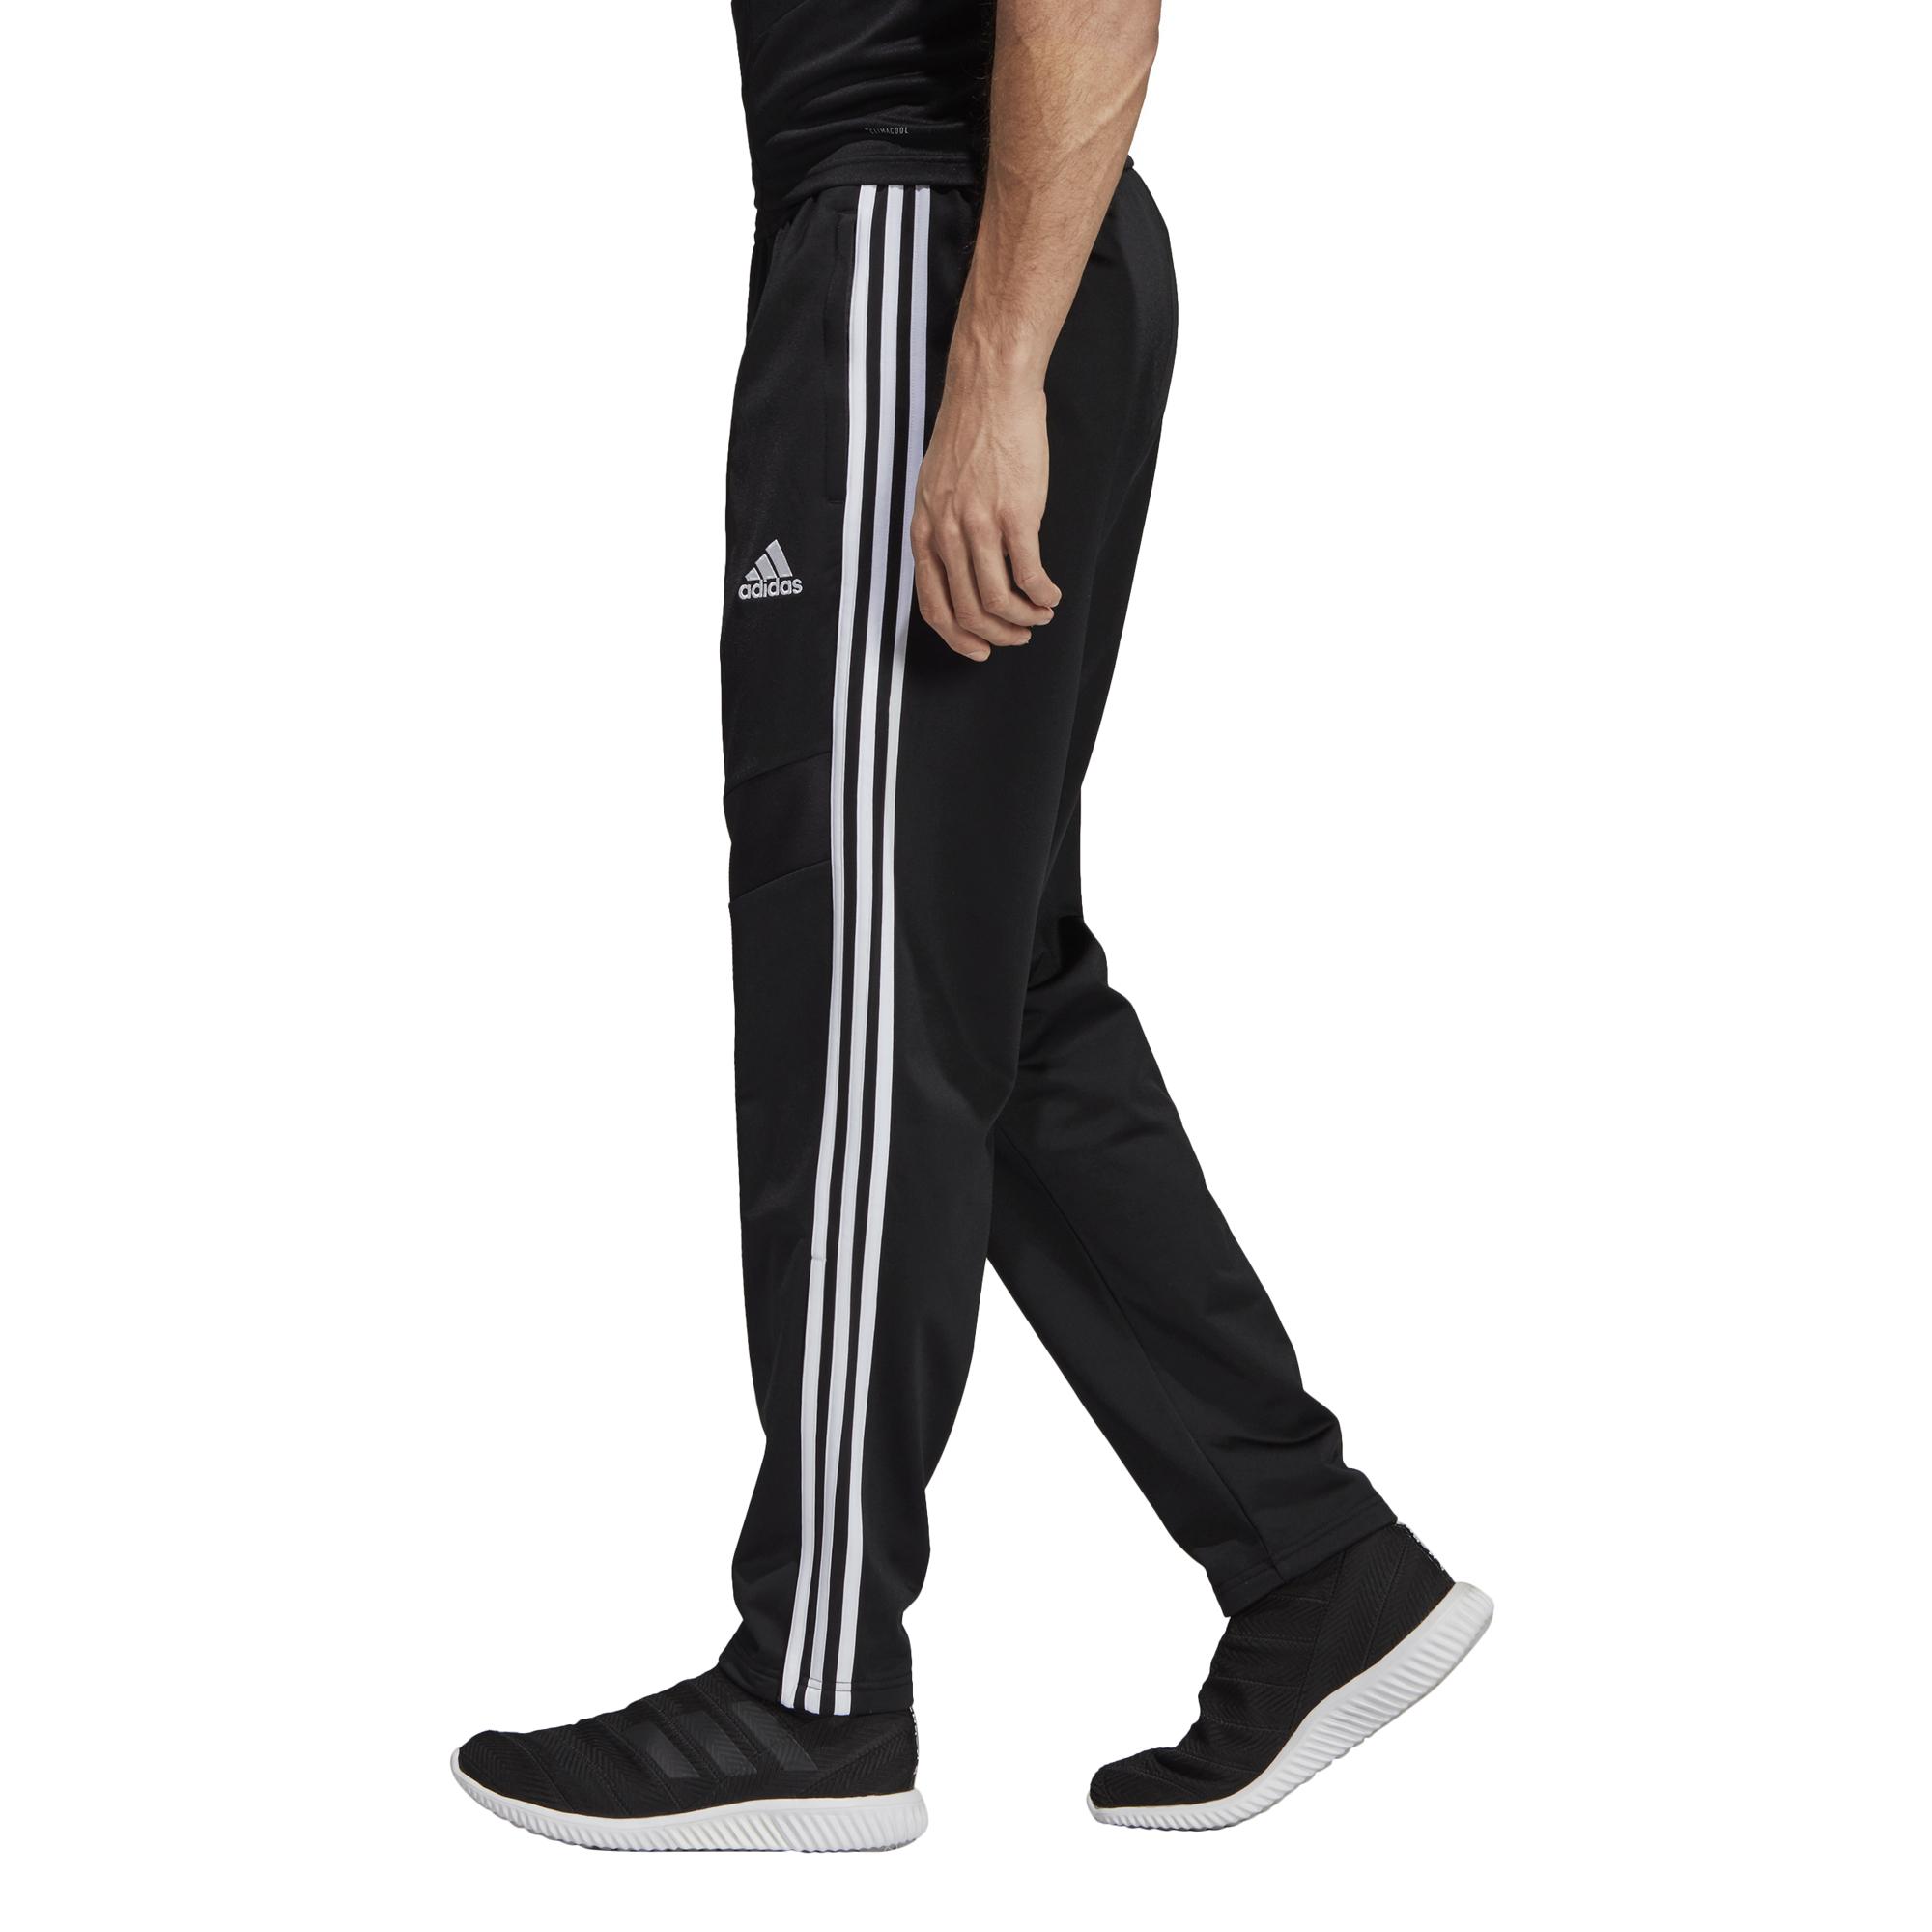 pantalon adidas entrainement foot